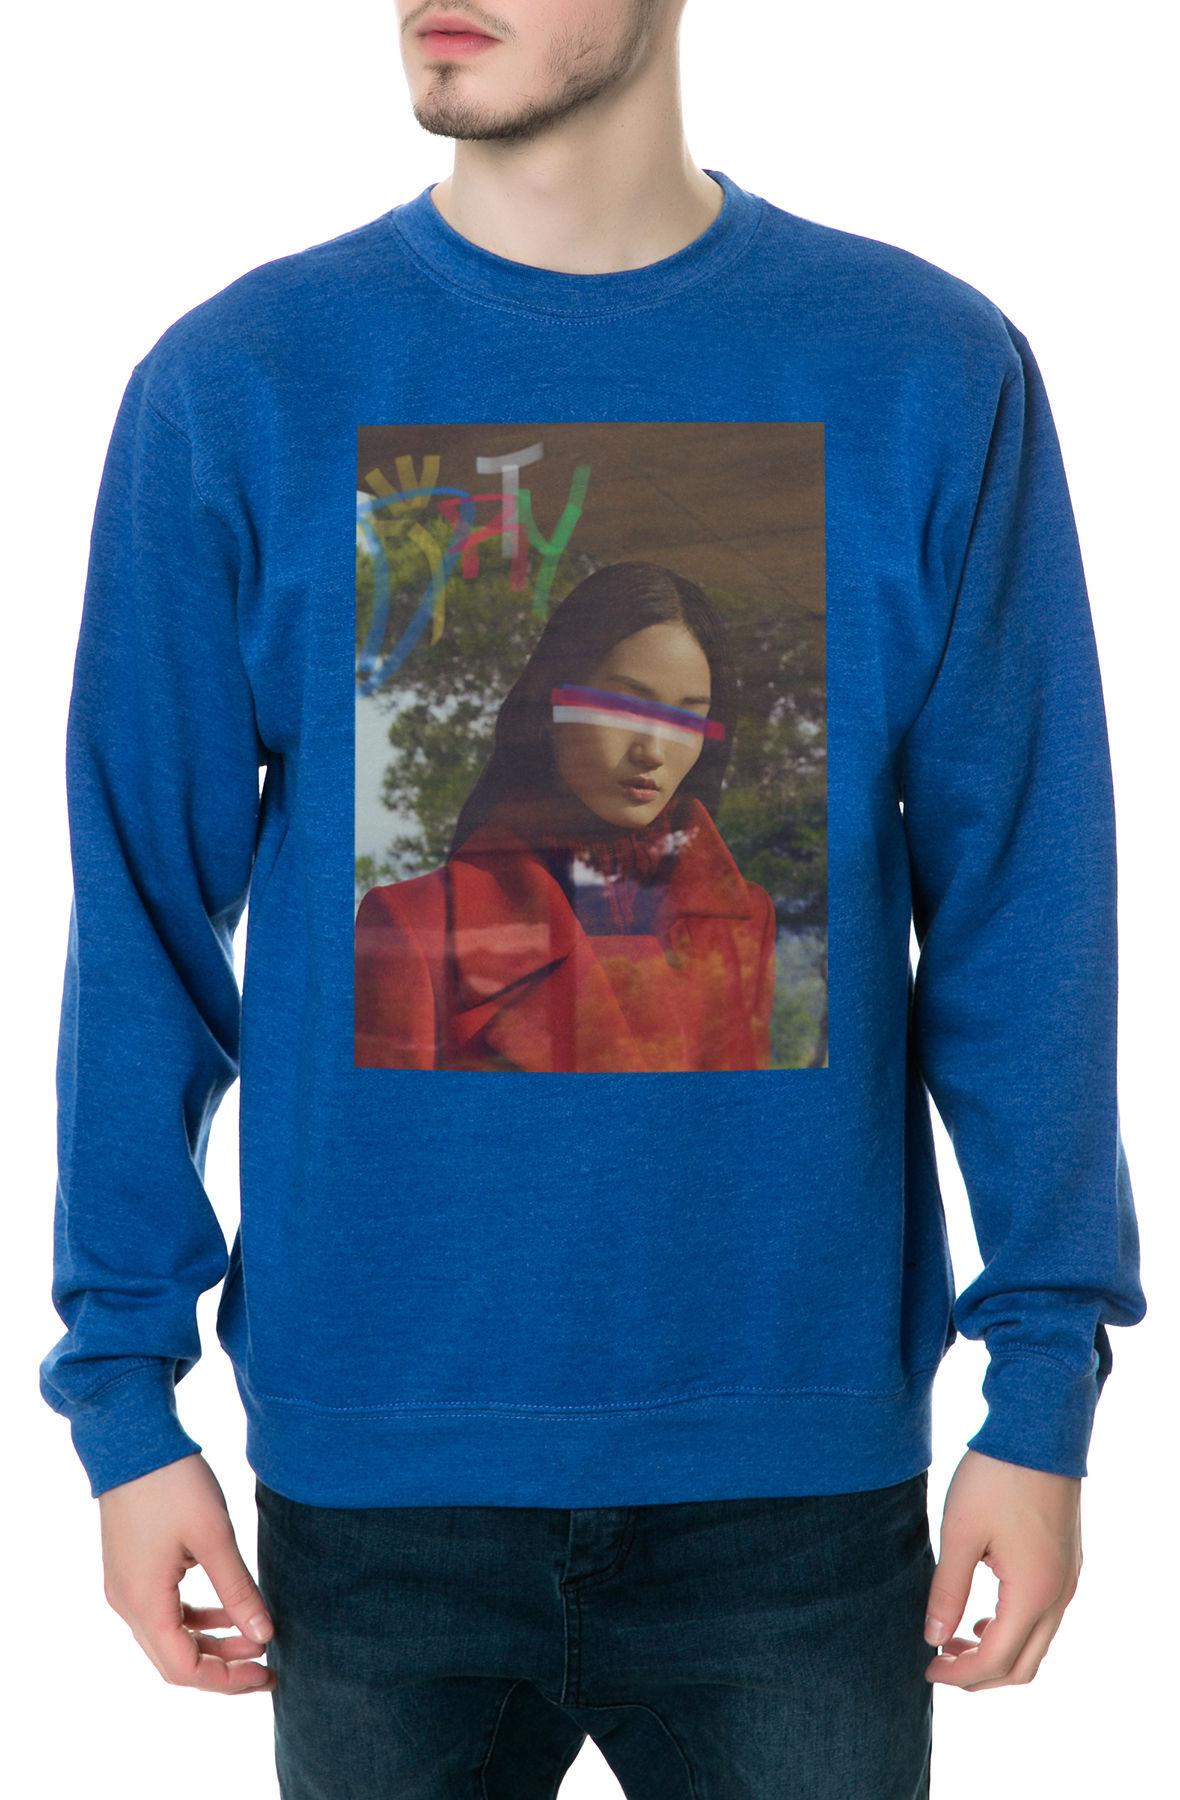 The Lust 70 Crewneck Sweatshirt in Royal Blue